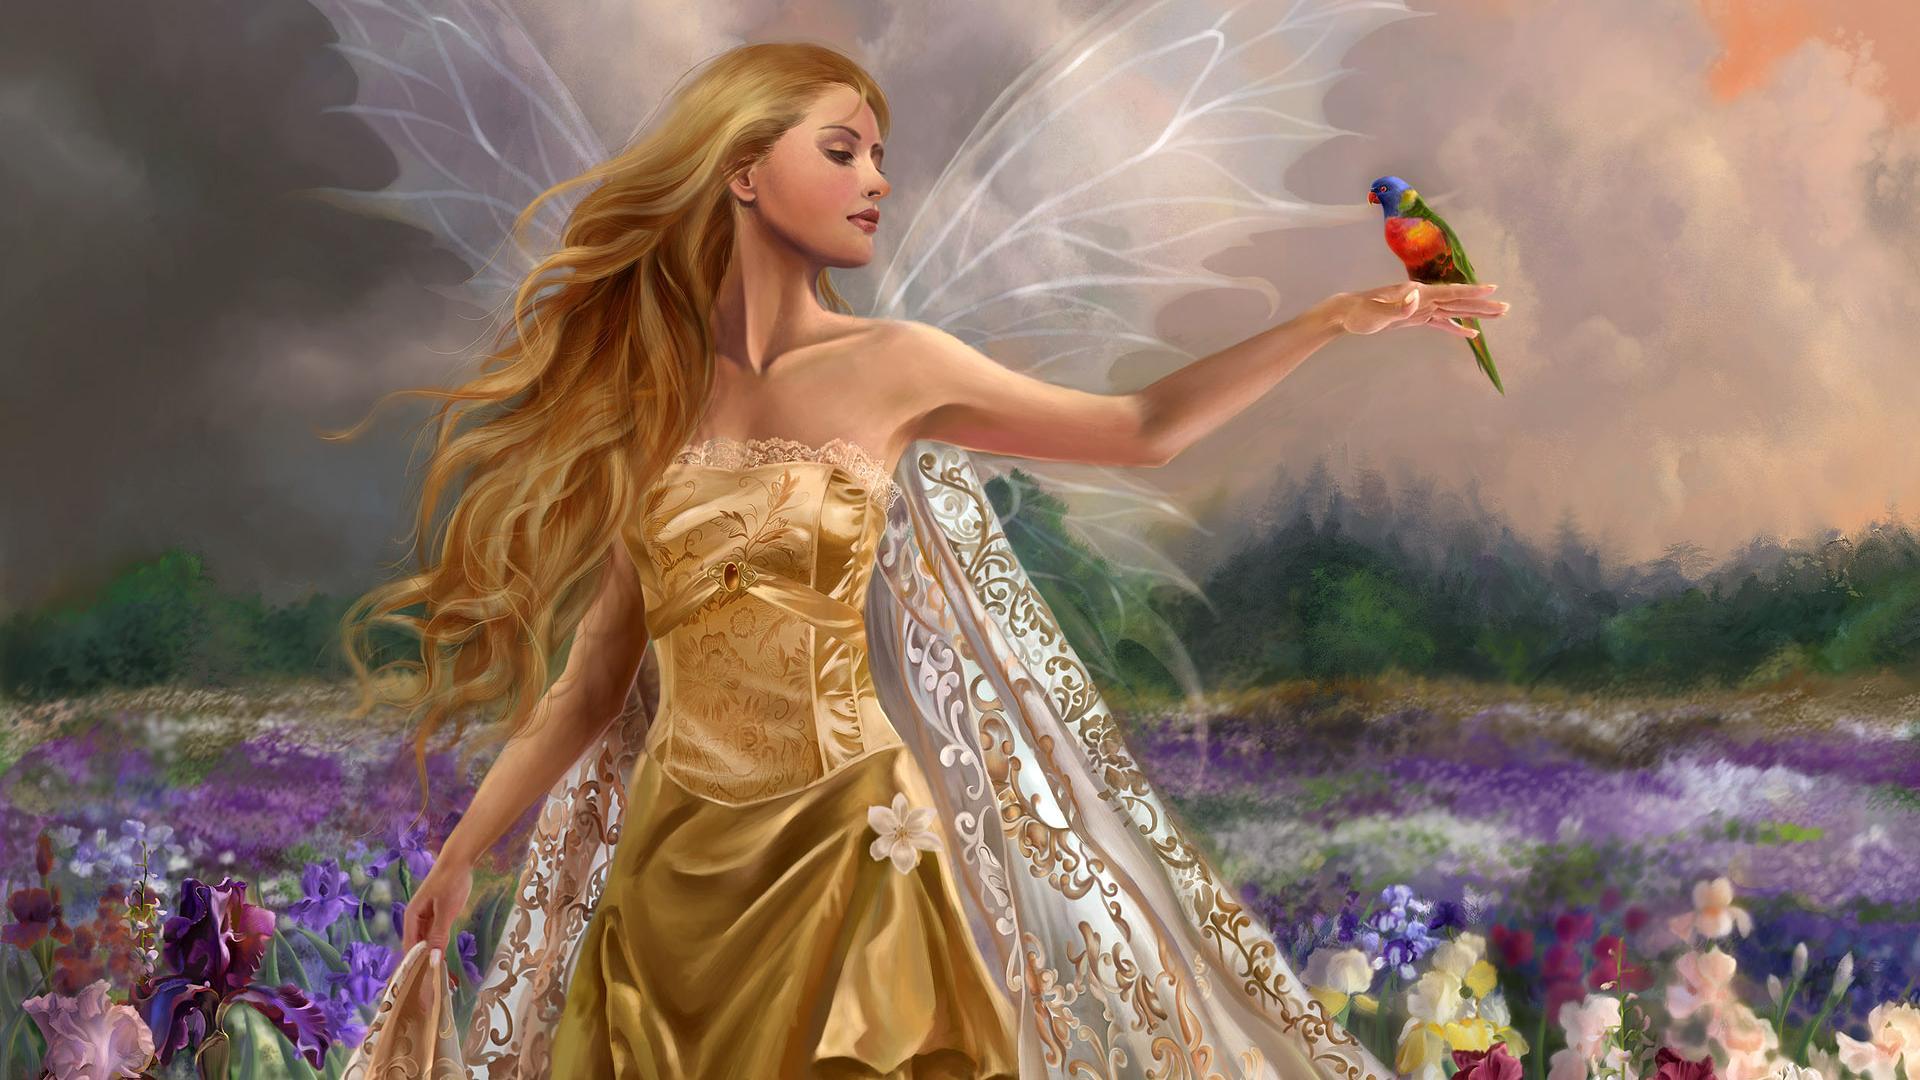 wonderful fantasy wallpaper 41608